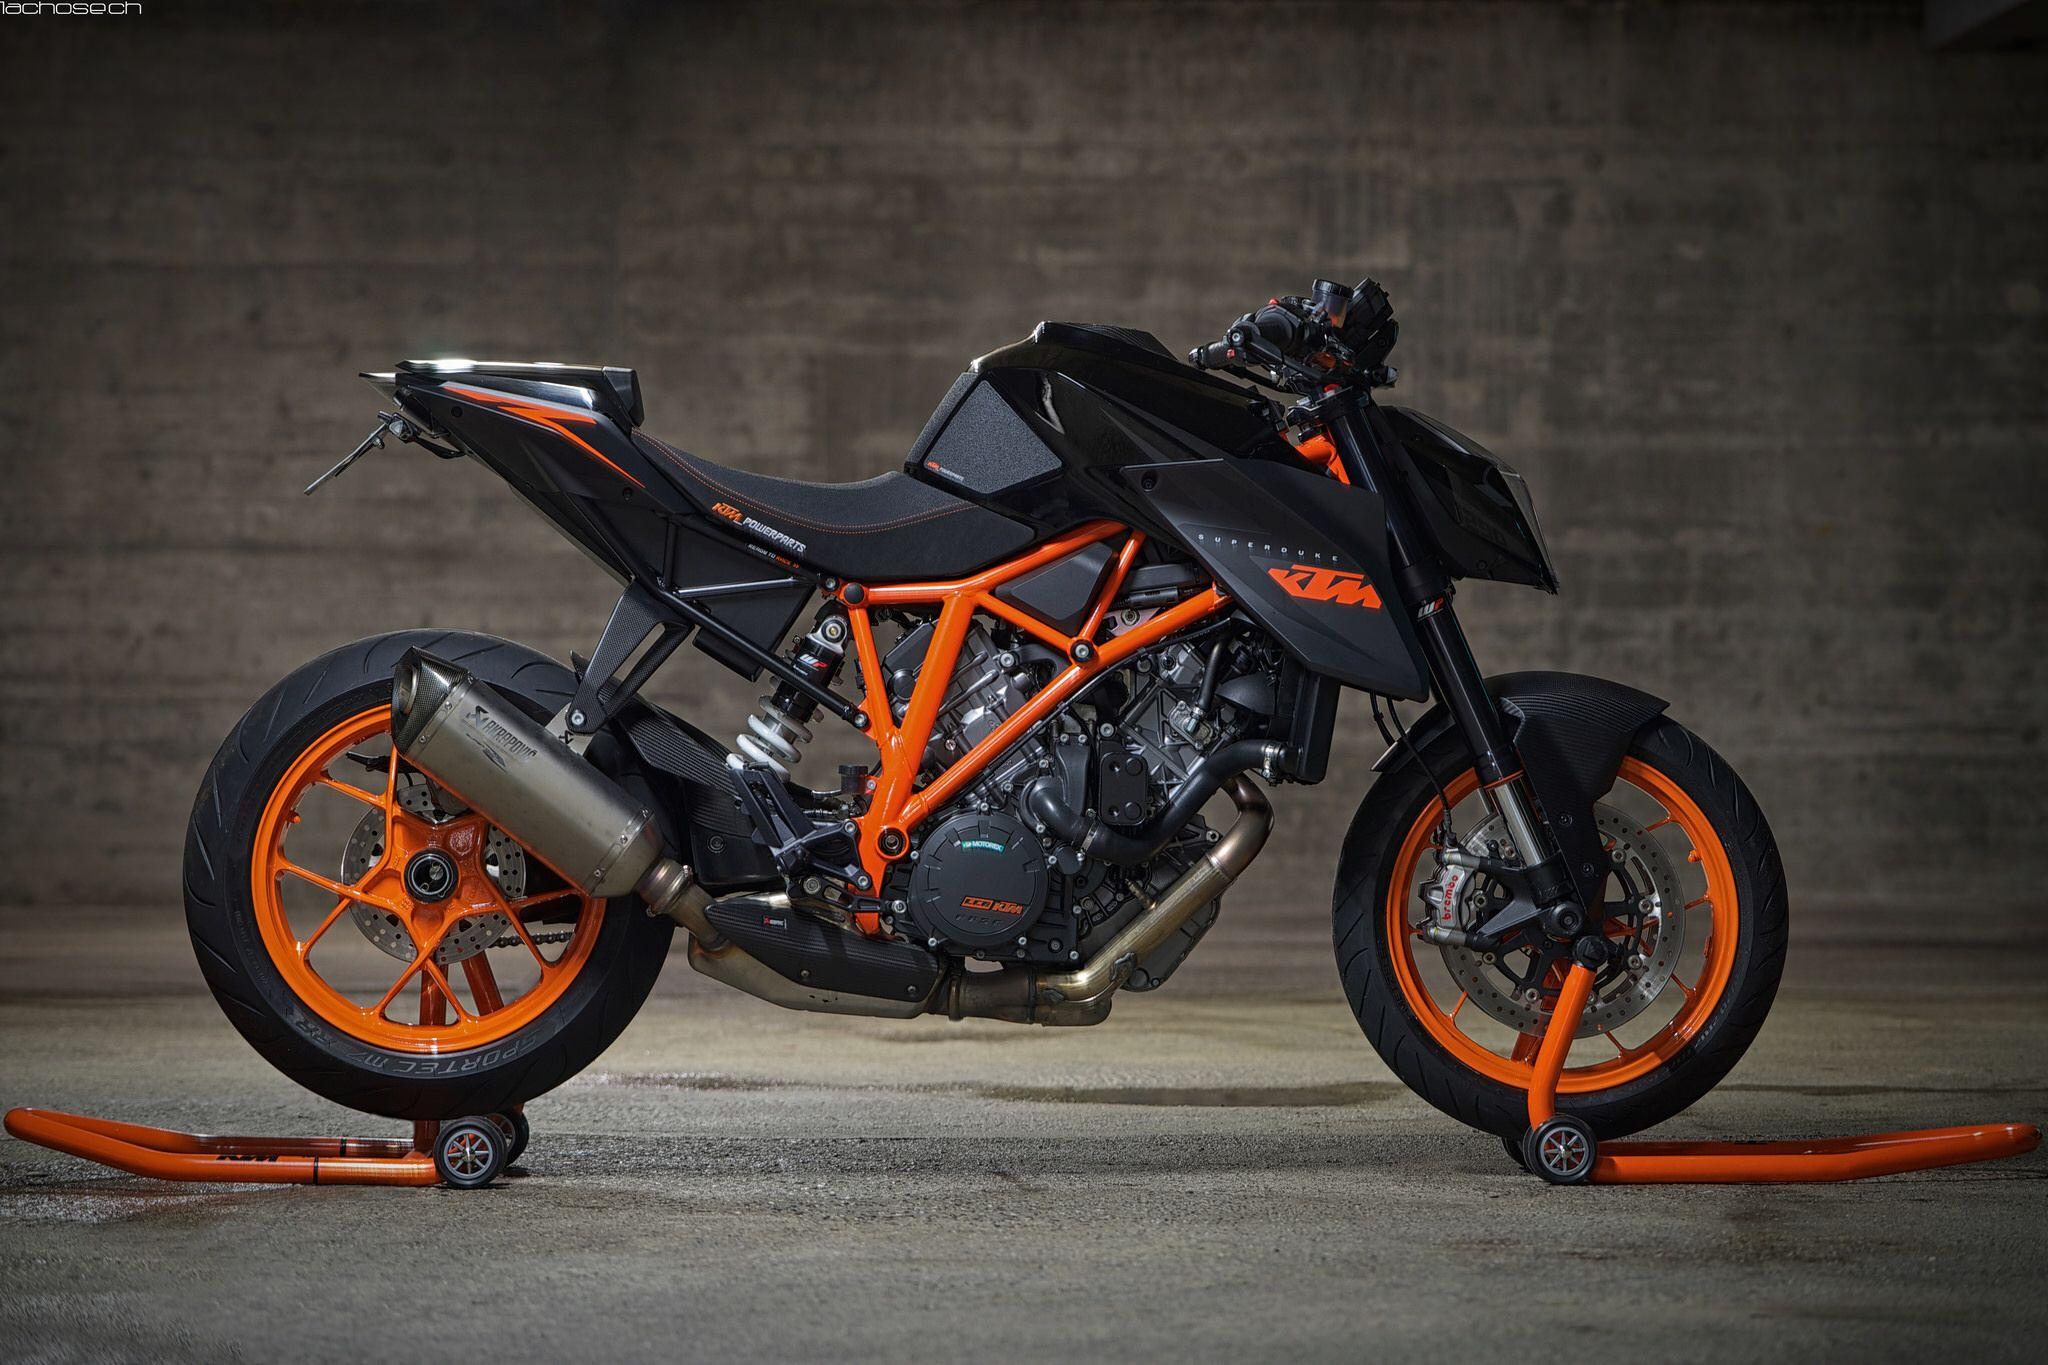 Ktm Superduke R 1290 Voitures Et Motos Moto Motard Moto Sportive